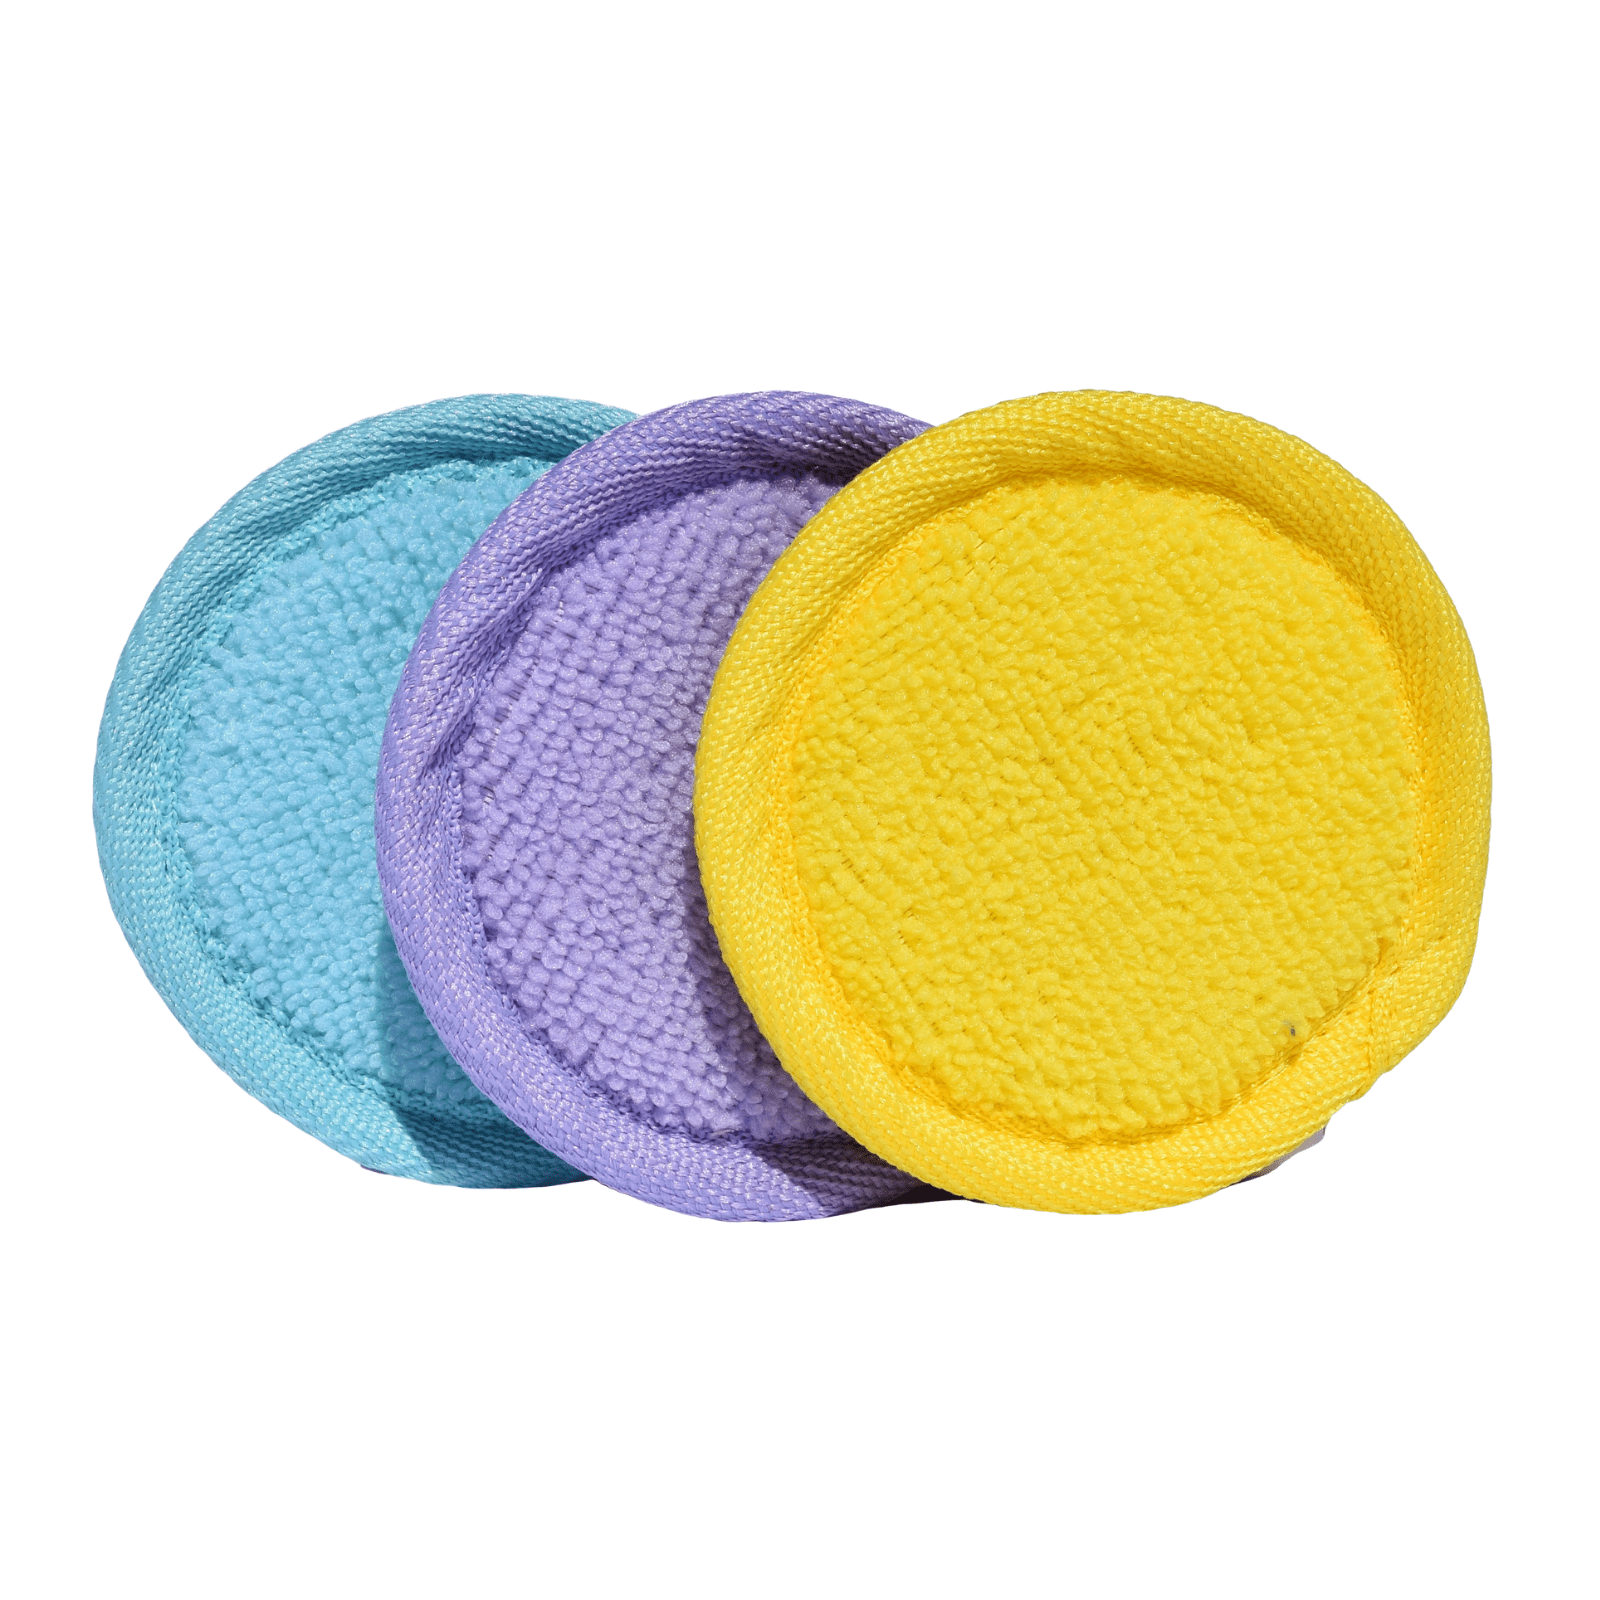 facial sponge